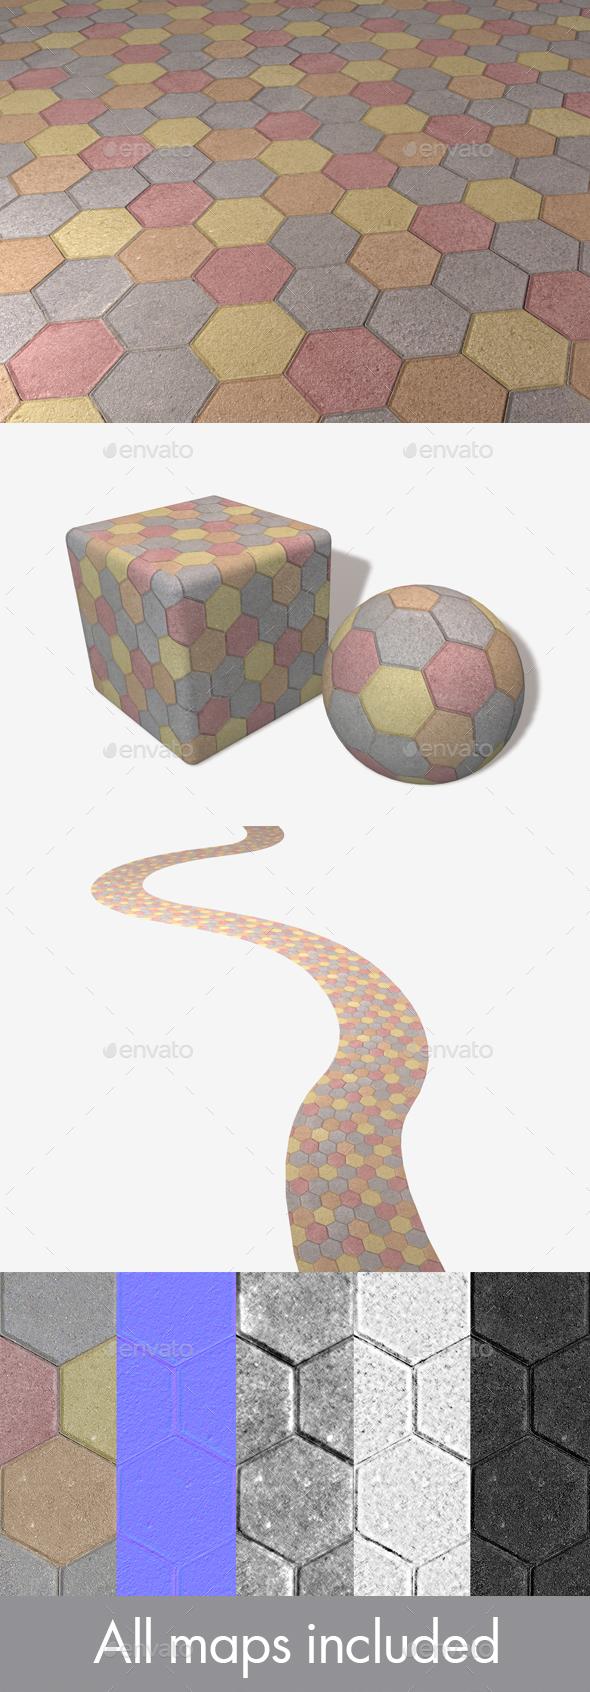 3DOcean Colourful Hexagon Paving Slabs Texture 20007679